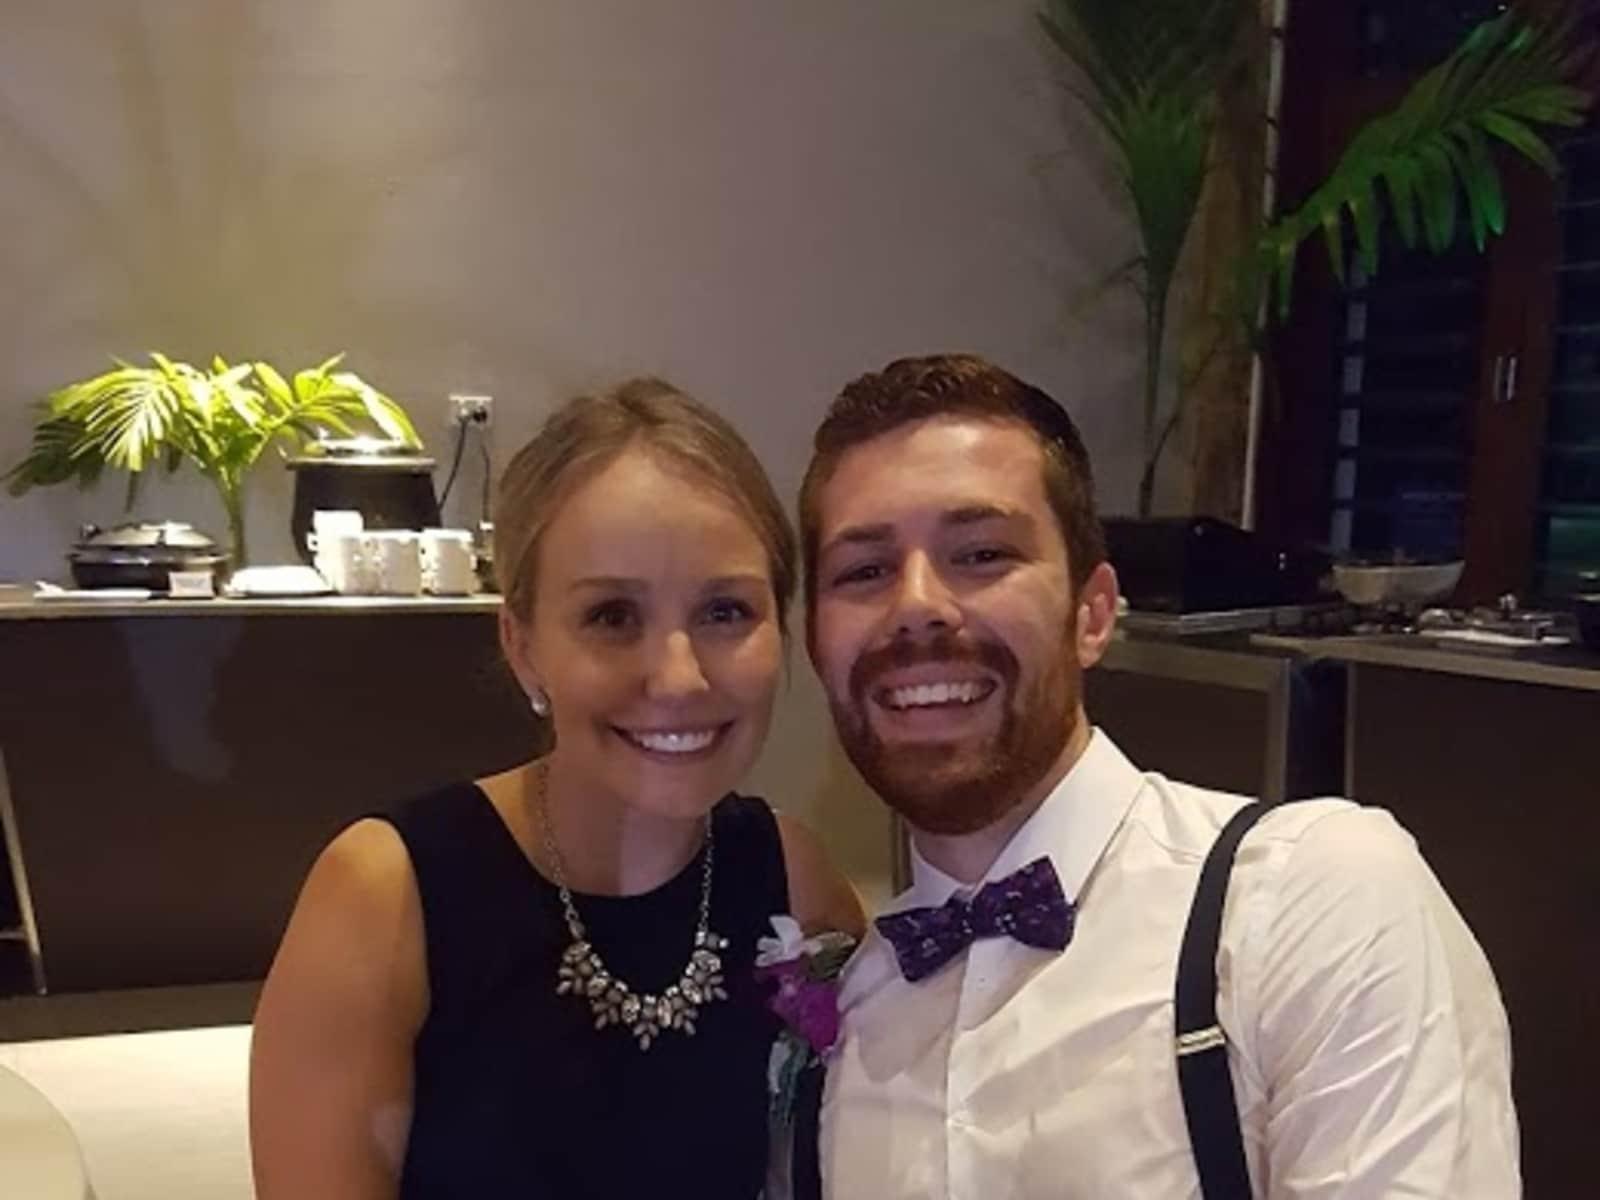 Phoebe & Daniel from Sydney, New South Wales, Australia